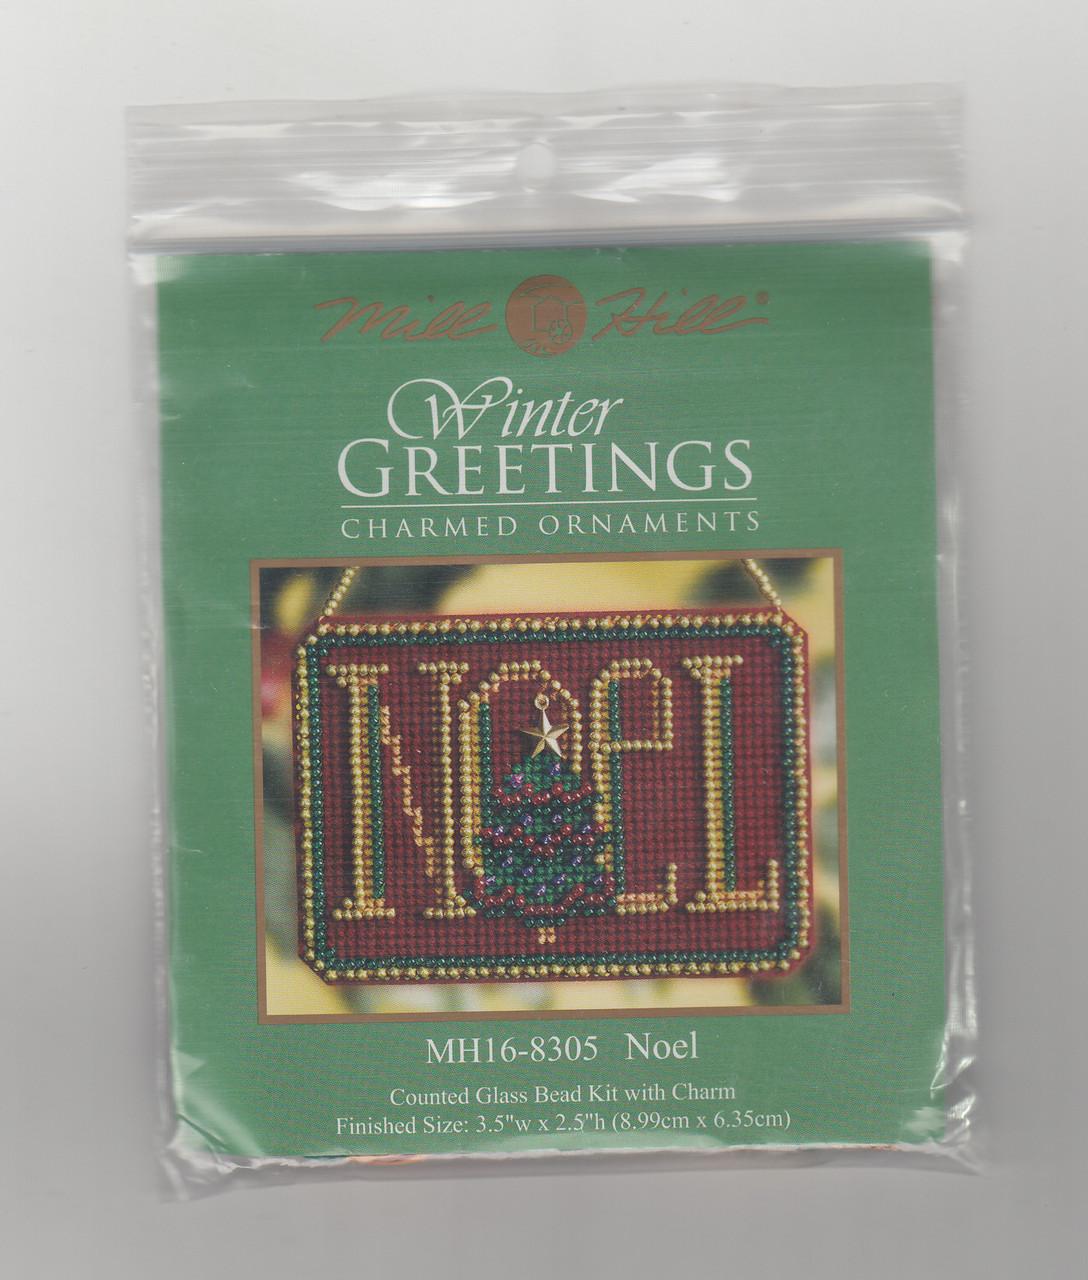 Mill Hill 2008 Winter Greetings Charmed Ornament - Noel